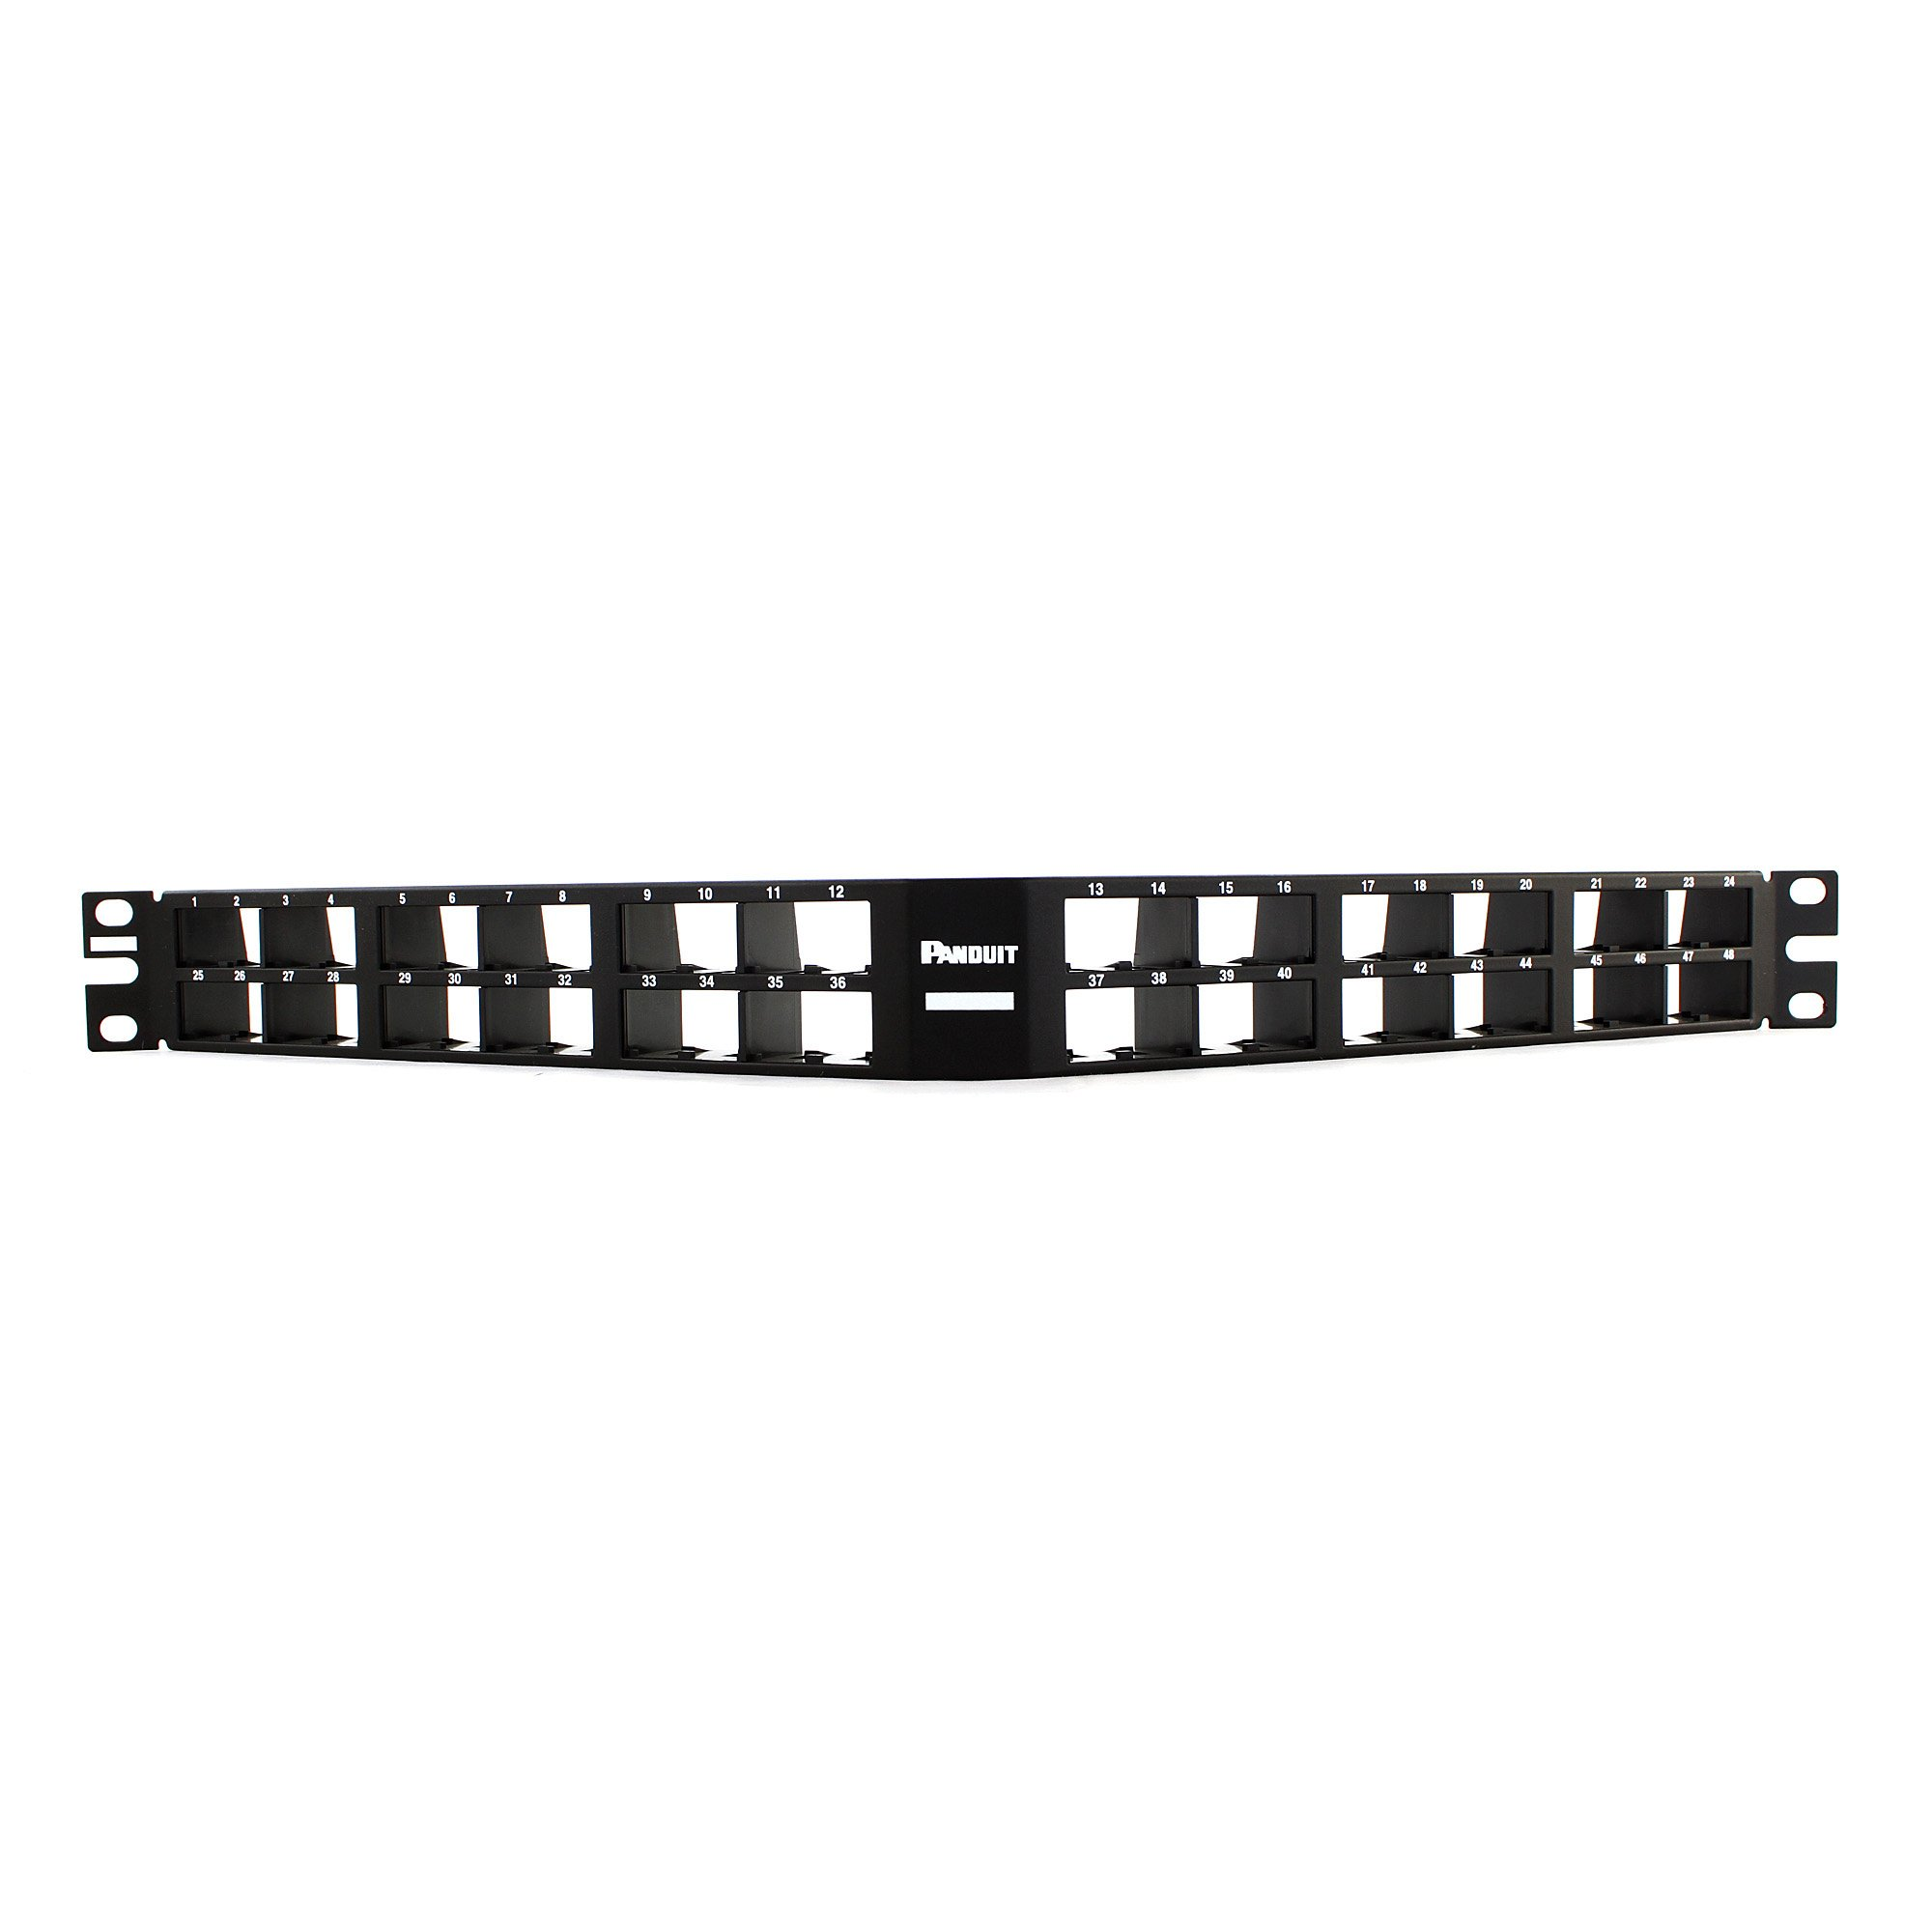 Panduit CPPA48HDWBLY Angled High-Density 48-Port Patch Panel, Black